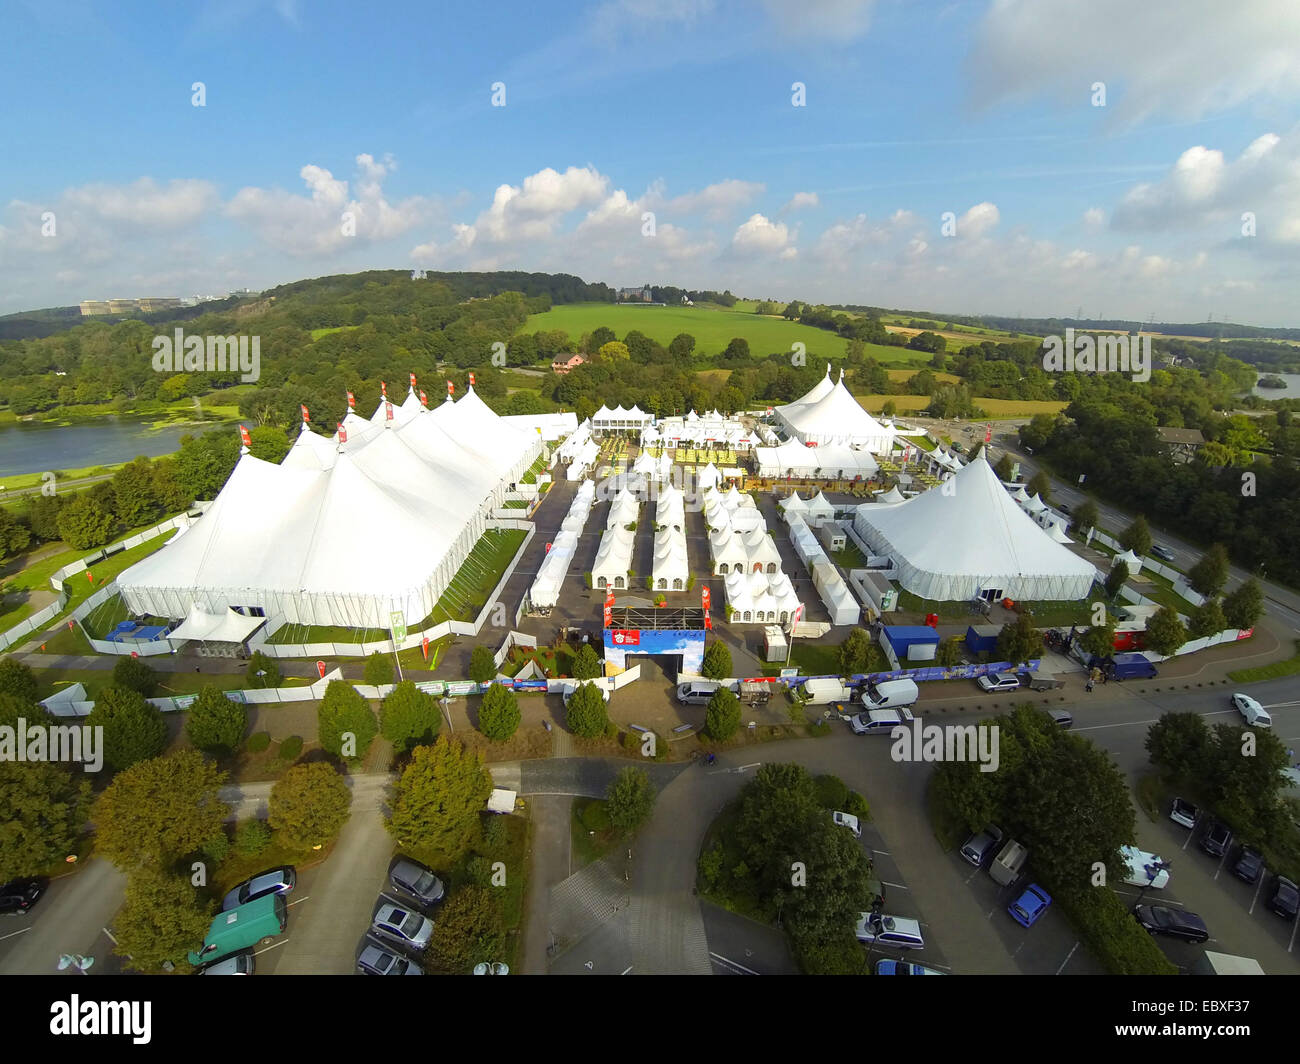 Zeltfestival Ruhr 2014 at Lake Kemnade, Ruhr-University in background, aerial view, Germany, North Rhine-Westphalia, - Stock Image